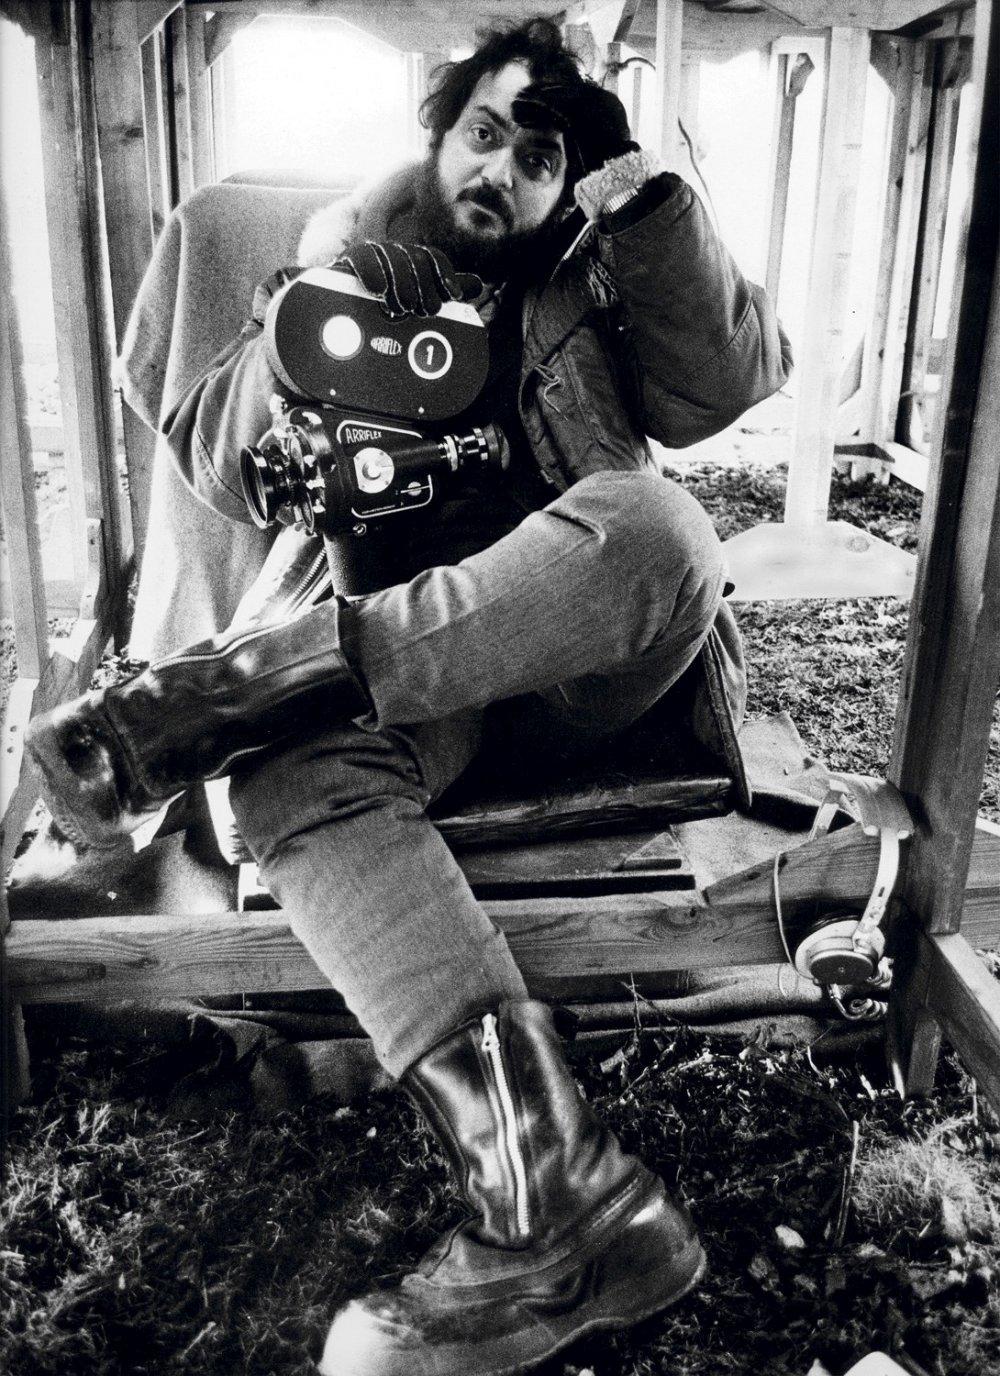 Stanley Kubrick, photographed by Dmitri Kasterine in 1970 on the set of A Clockwork Orange.